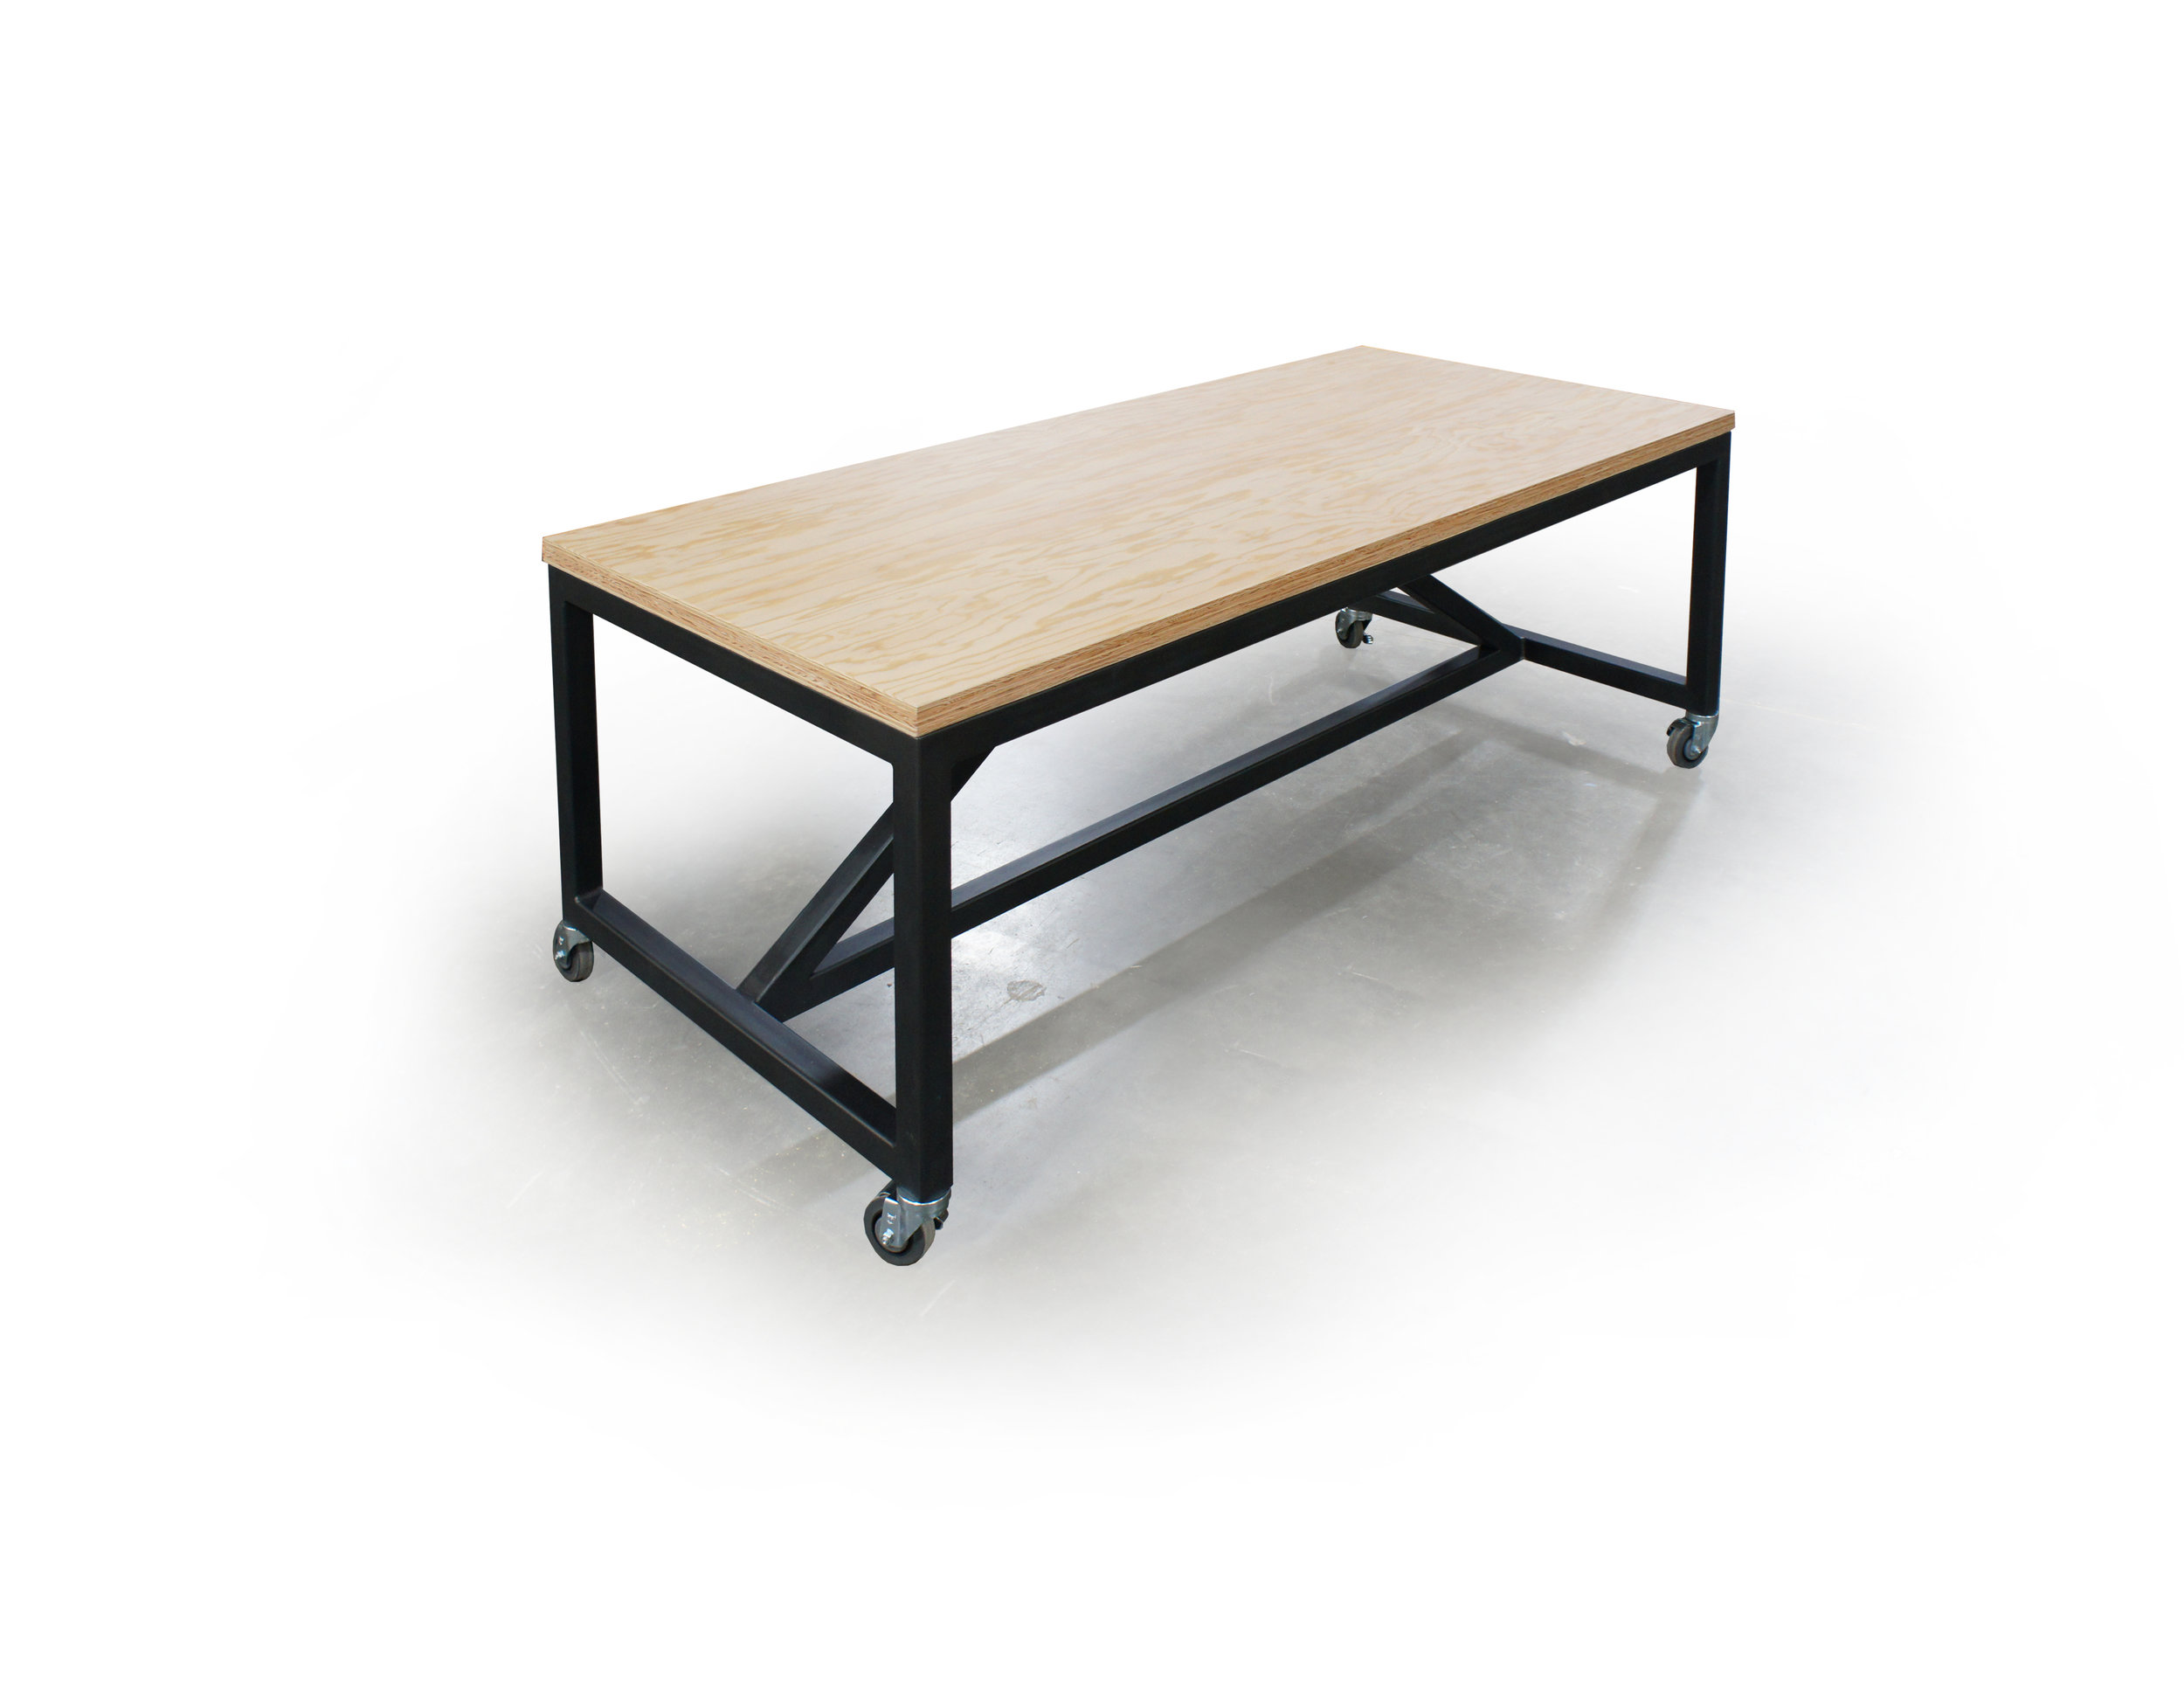 birch multiply top w/ black painted steel frame